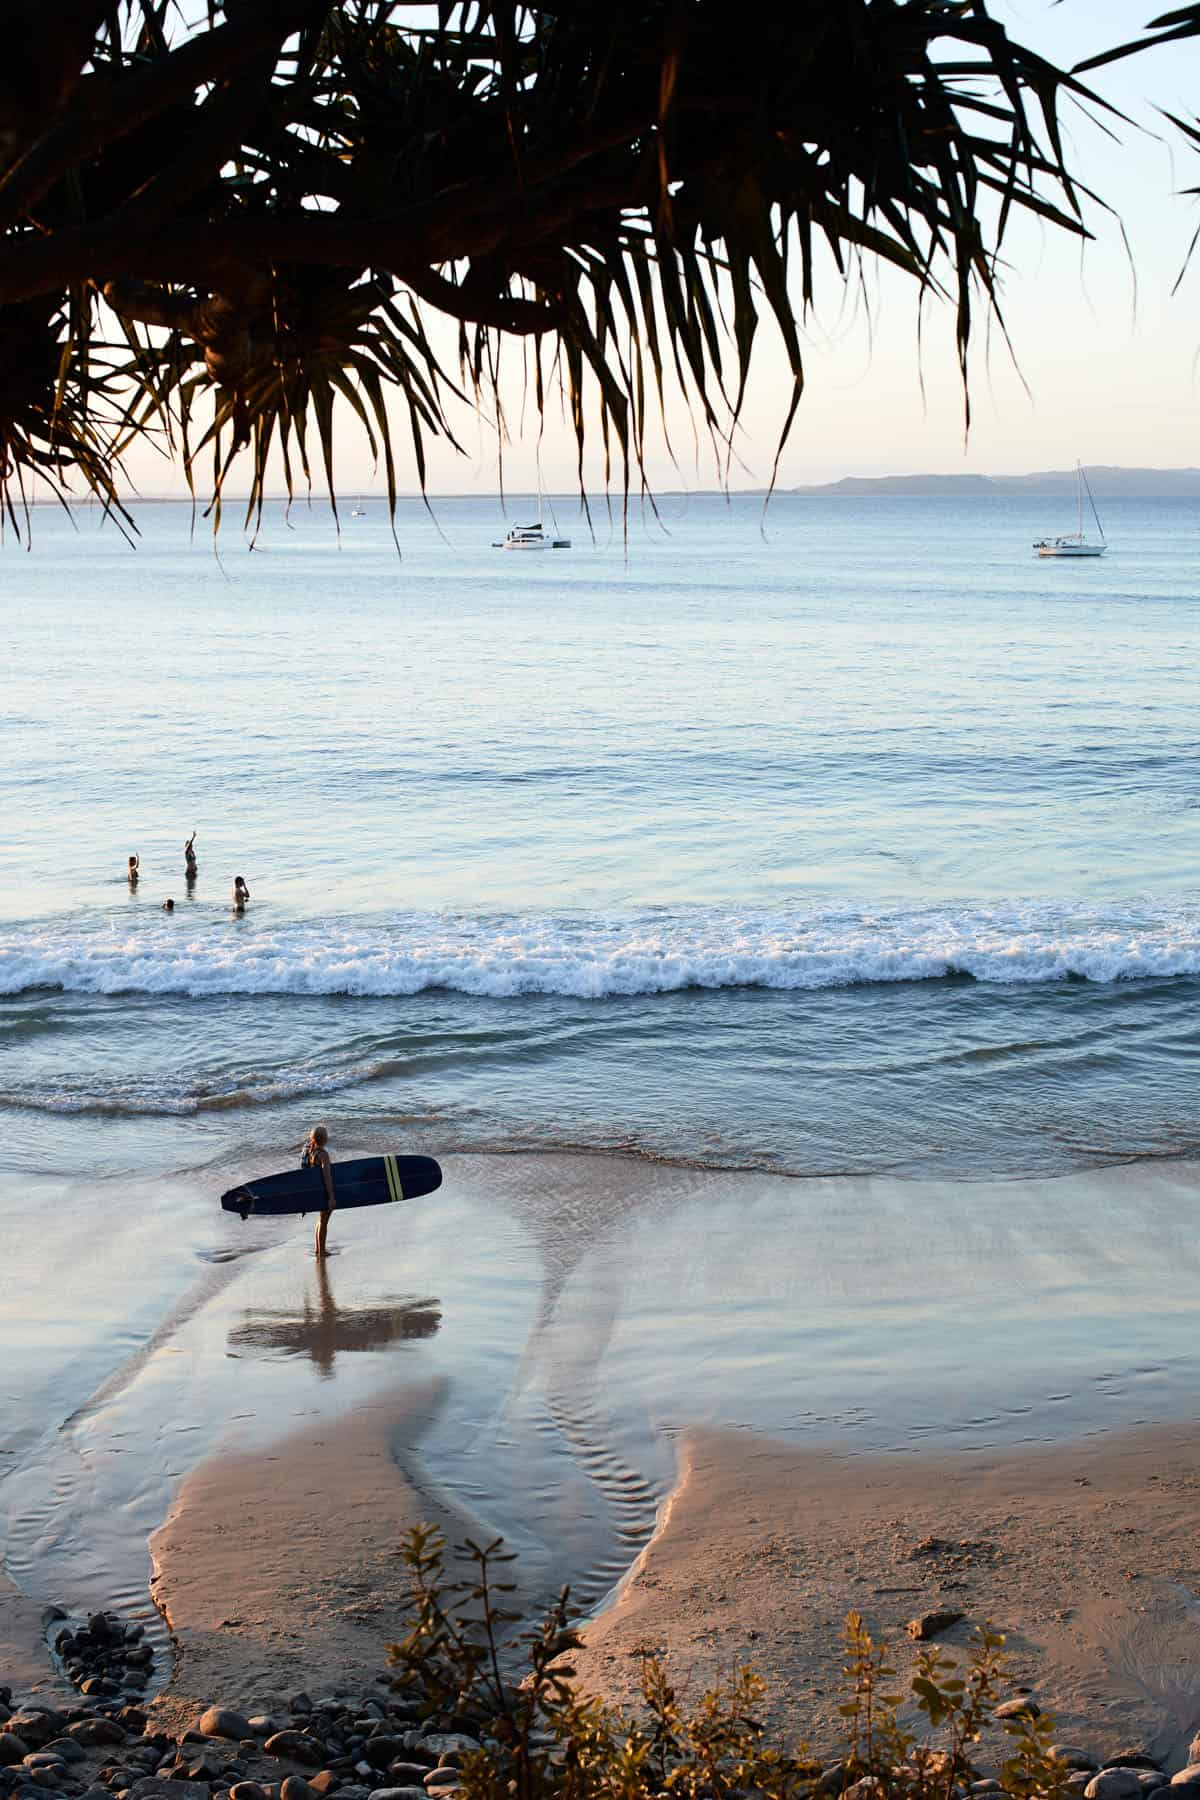 queensland-australia-noosa-beach